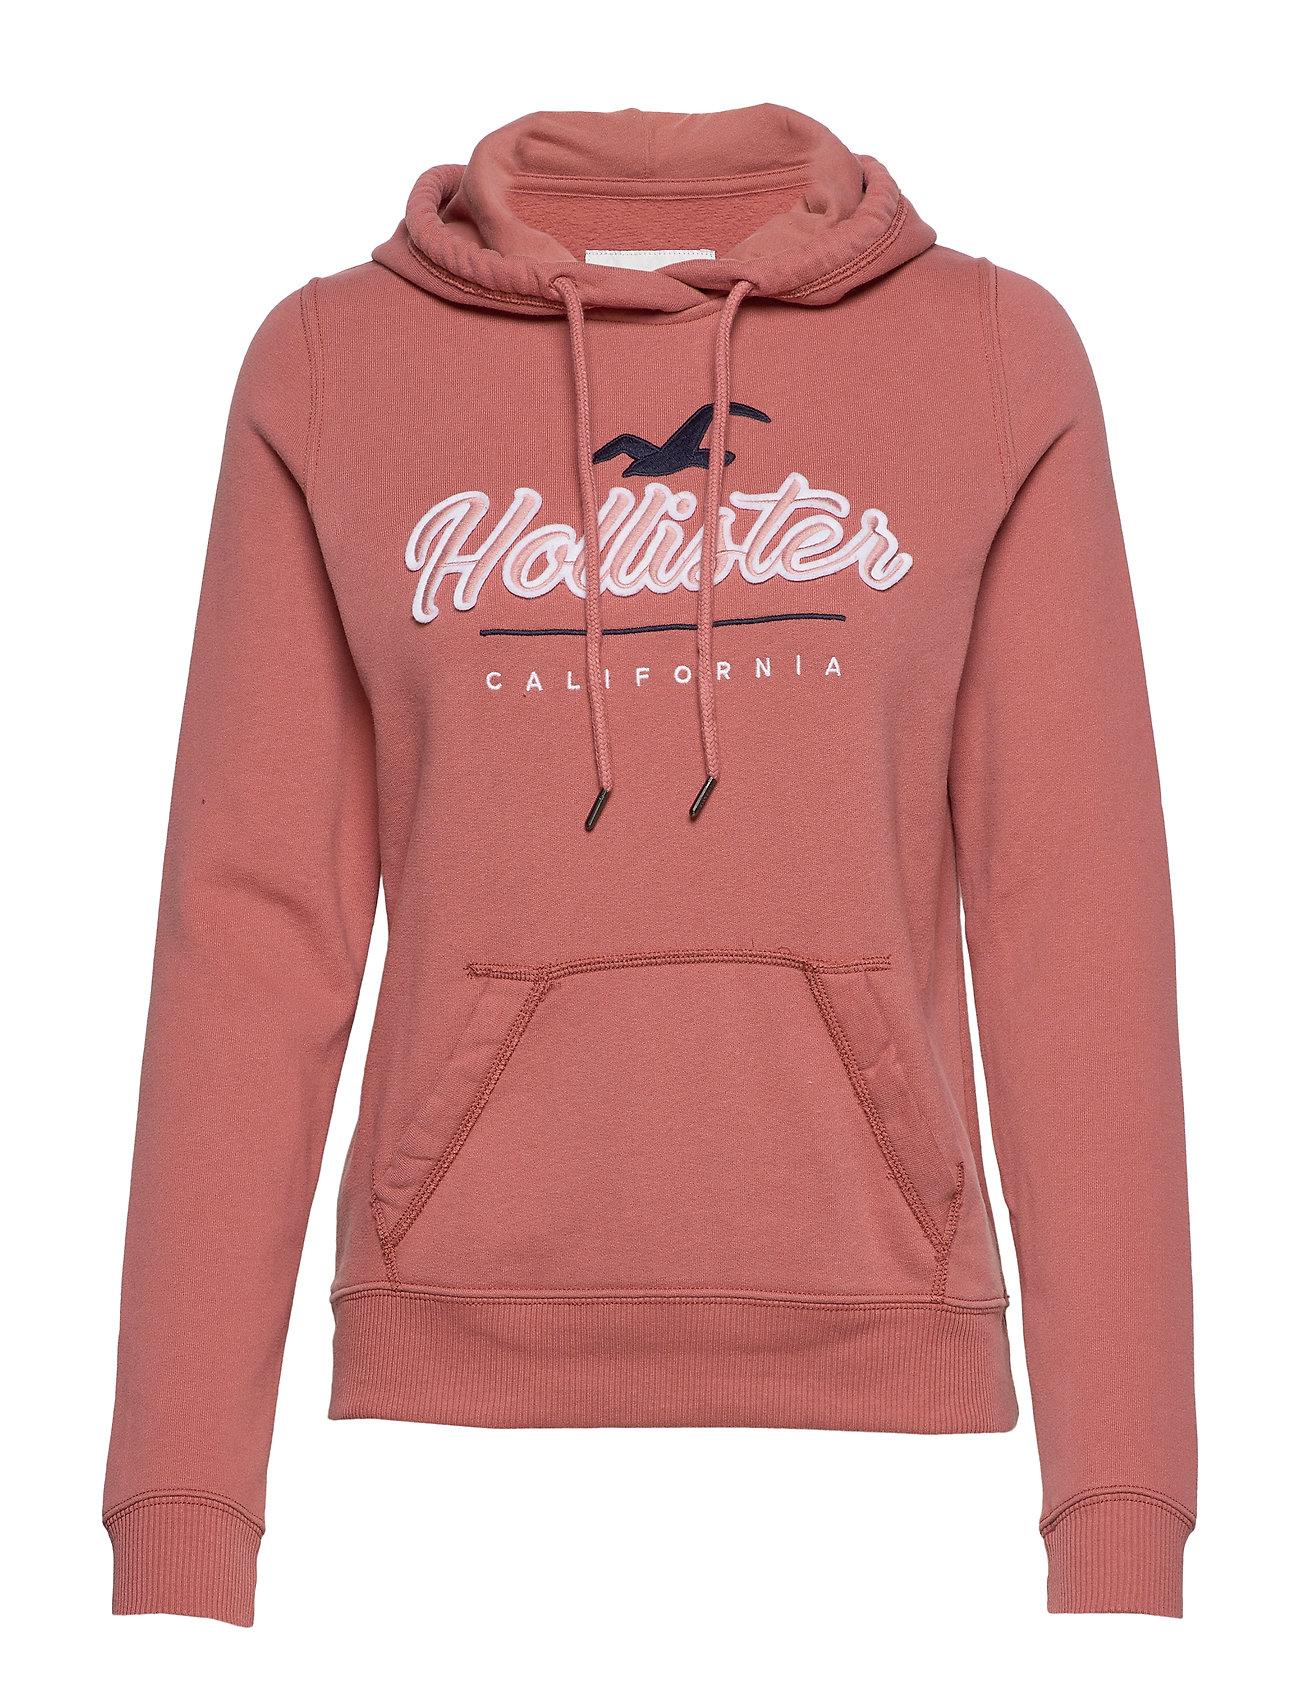 Hollister Popover Fleece Hoodie - LIGHT PINK DD